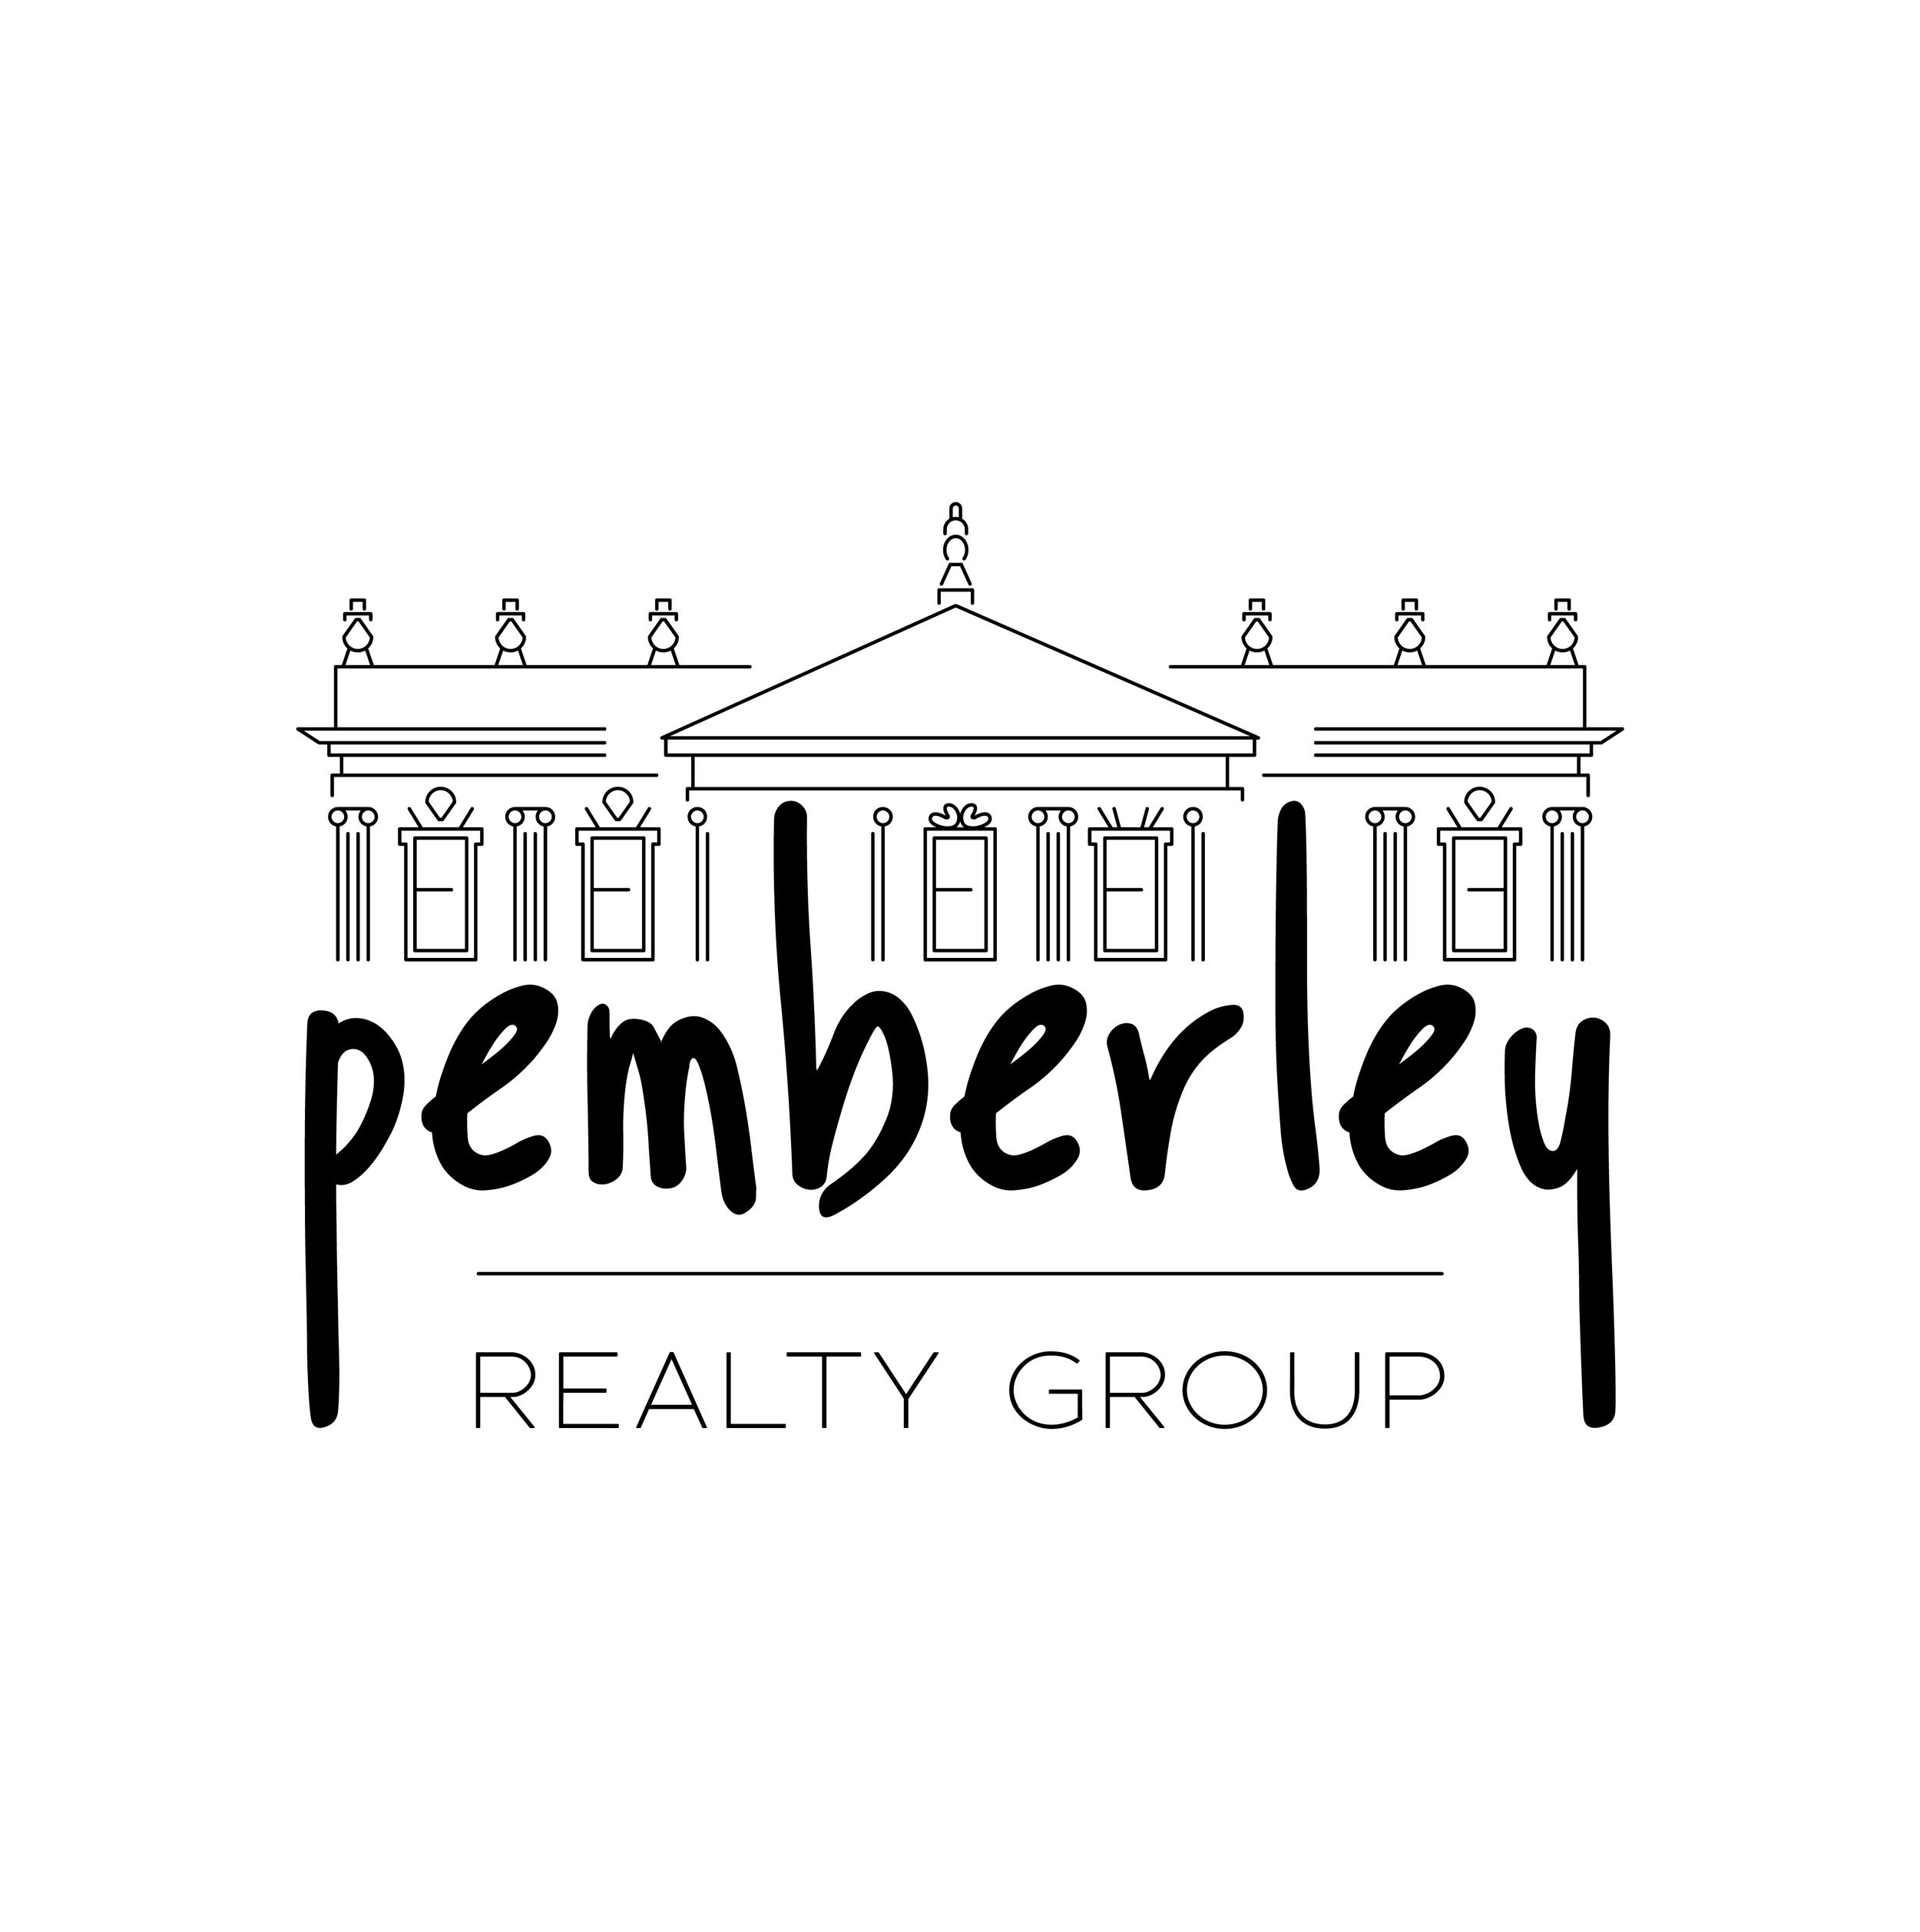 20190617_CompassifyLogo_PemberleyGroup_final_Logo-Black_Lockup.png